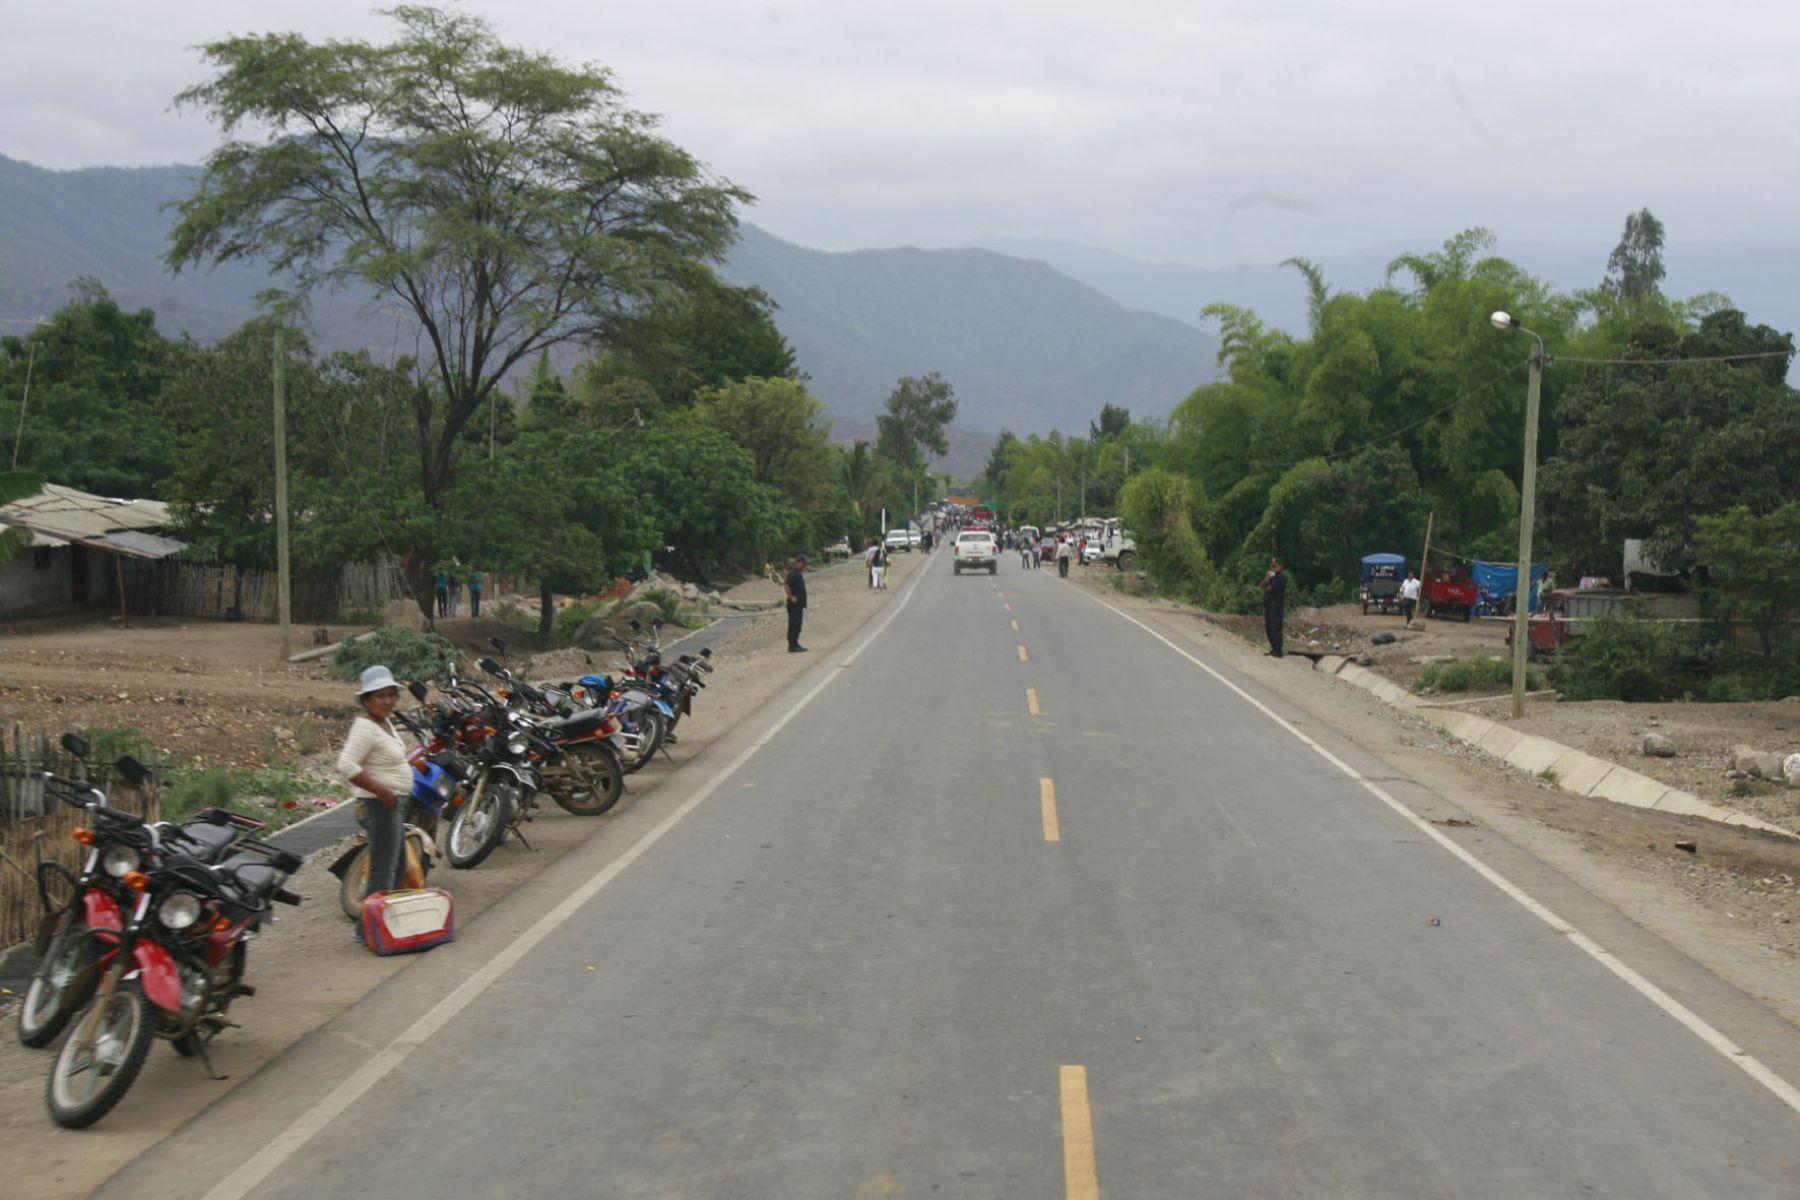 Carretera en Huancabamba. Foto: ANDINA/archivo.